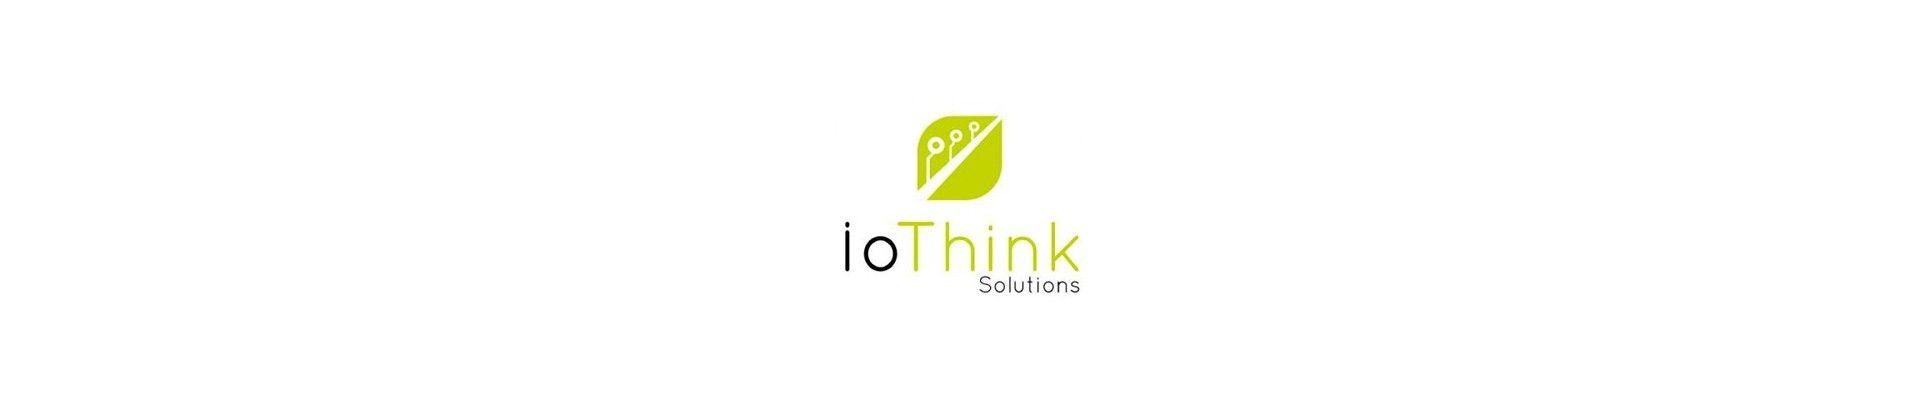 IoThink Solutions - Kheiron